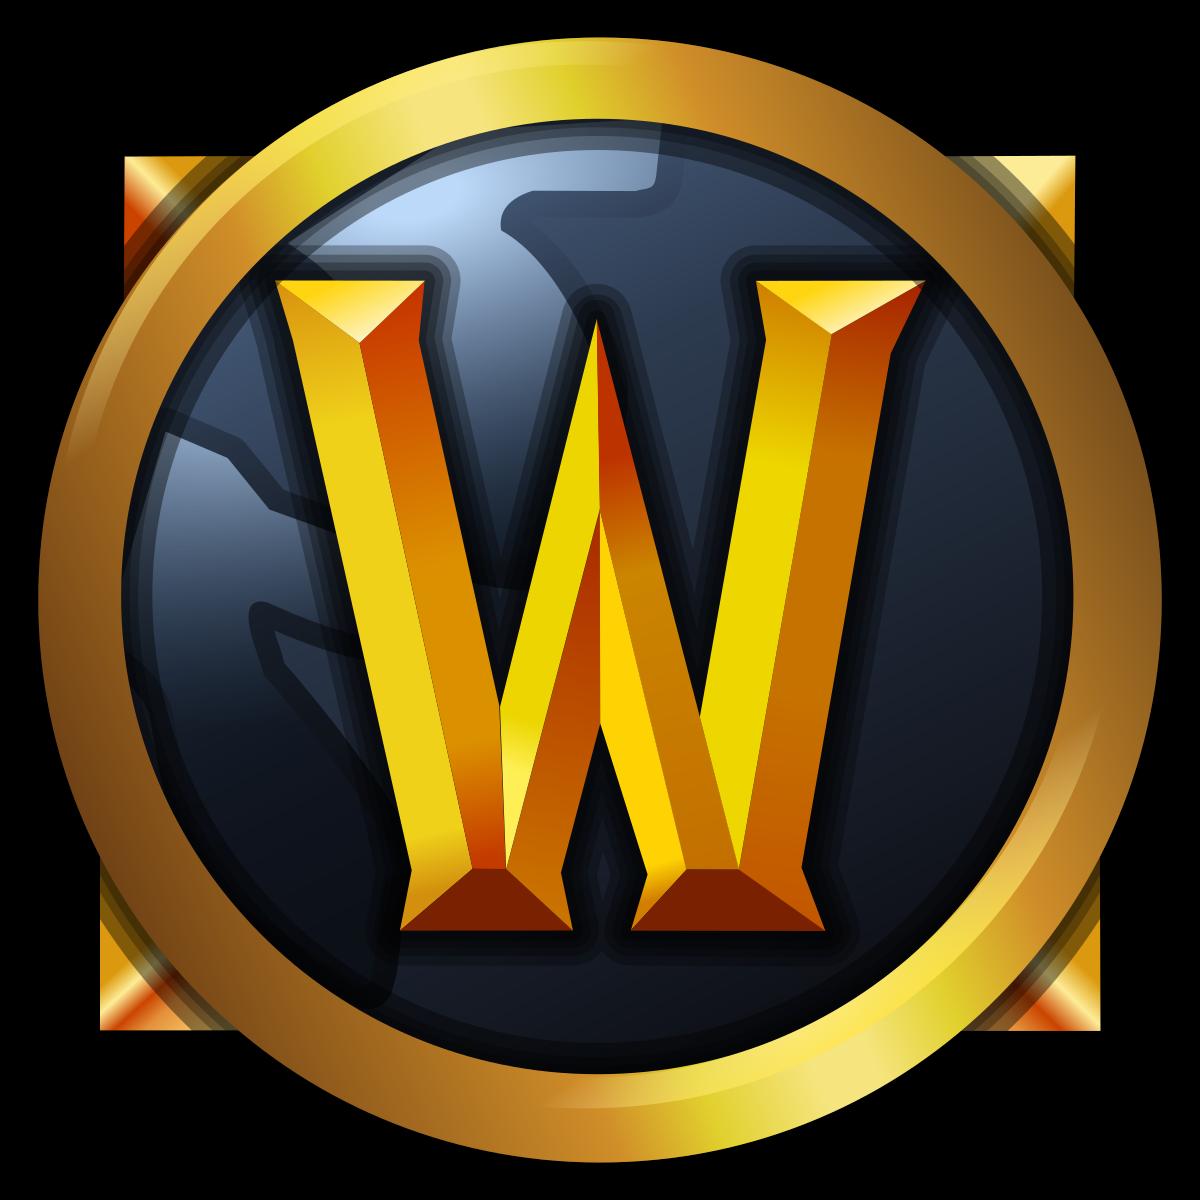 World of warcraft wikipedia. Wow clipart wow word